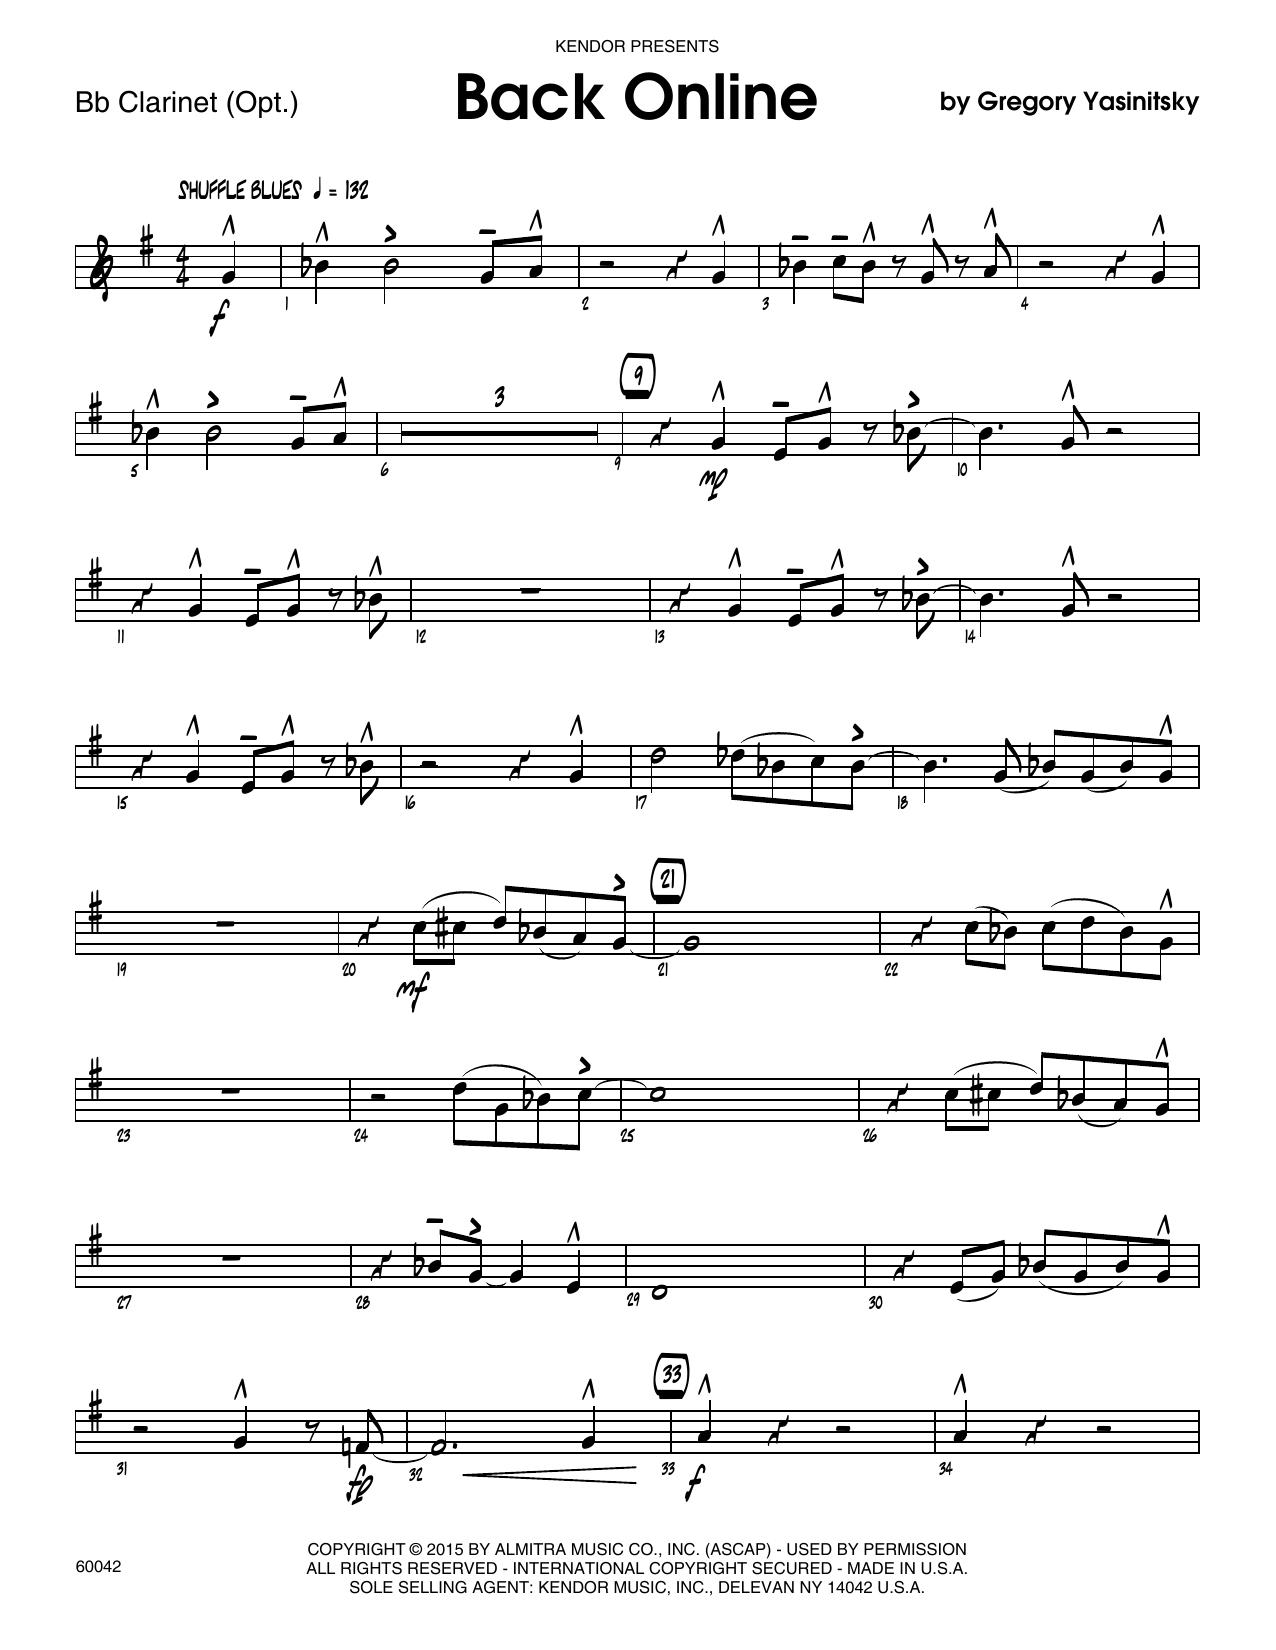 Back Online - Bb Clarinet Sheet Music